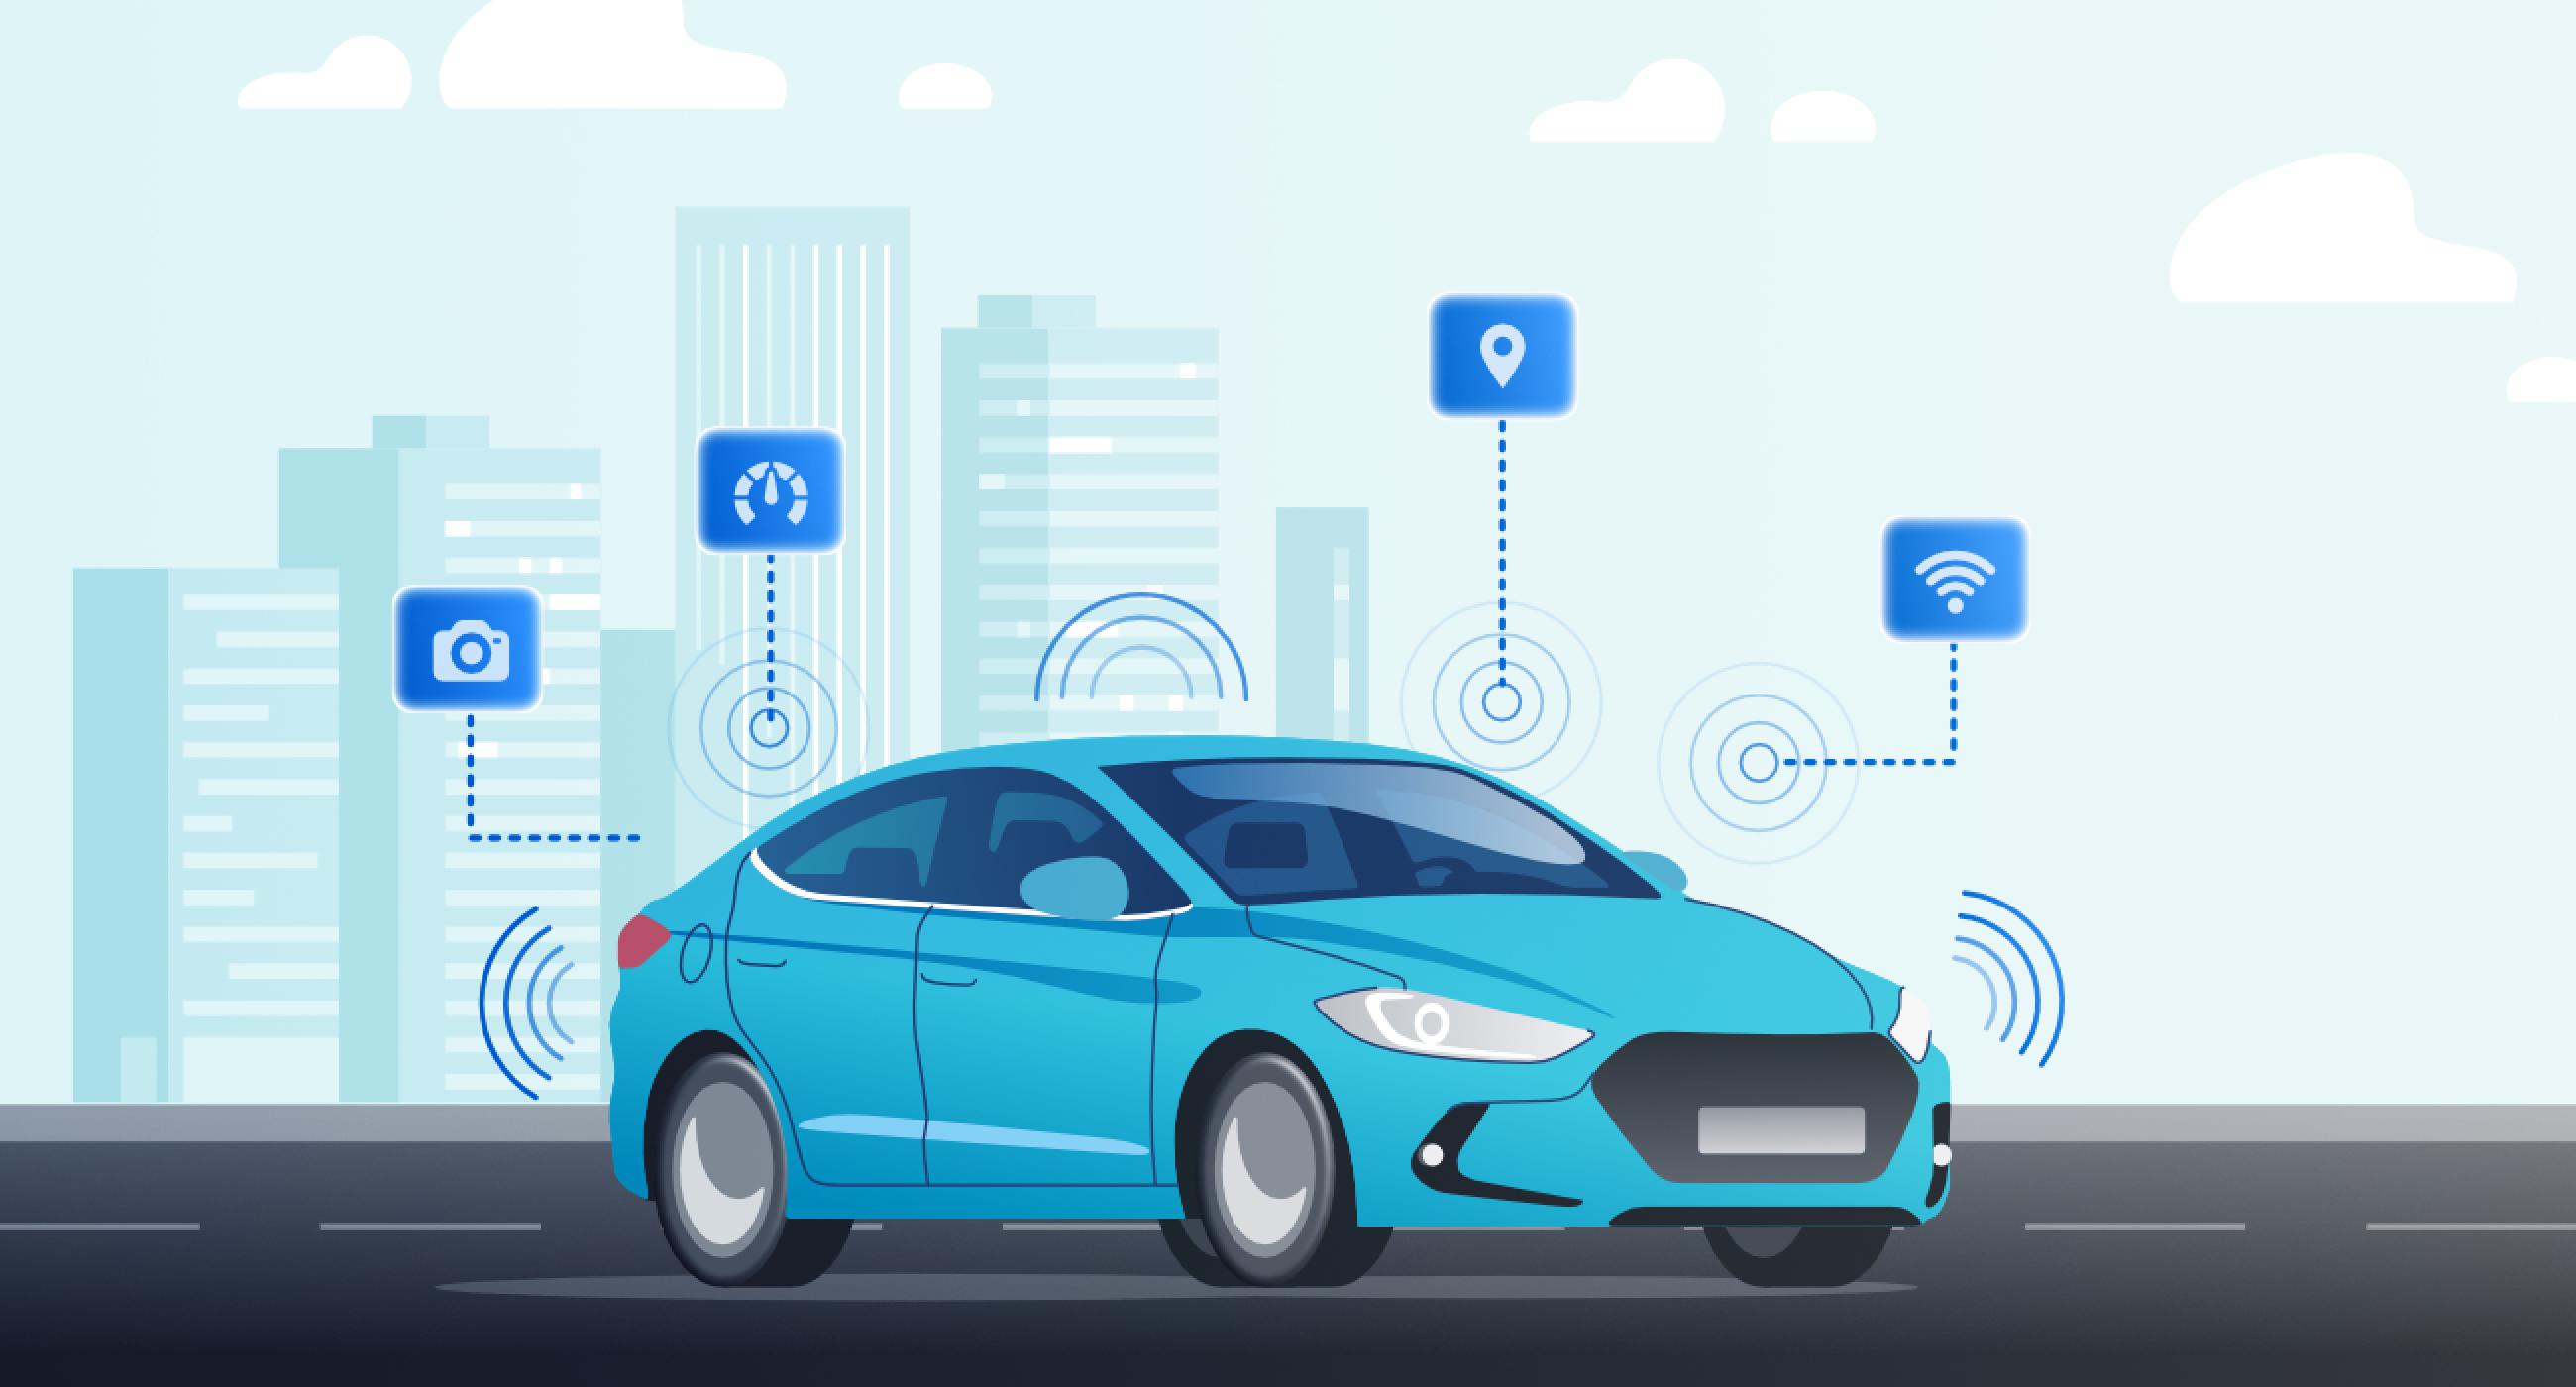 Top 7 Self Driving Car Companies of 2021